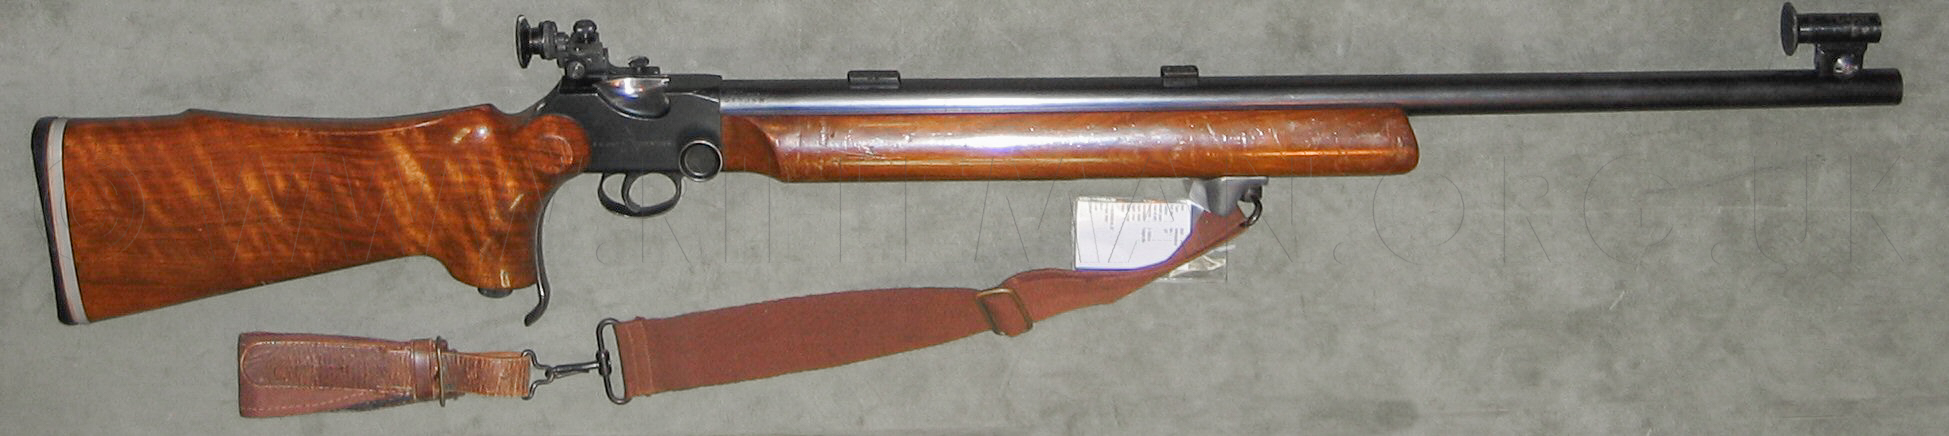 BSA Martini International  22RF Target Rifles - Marks I and II